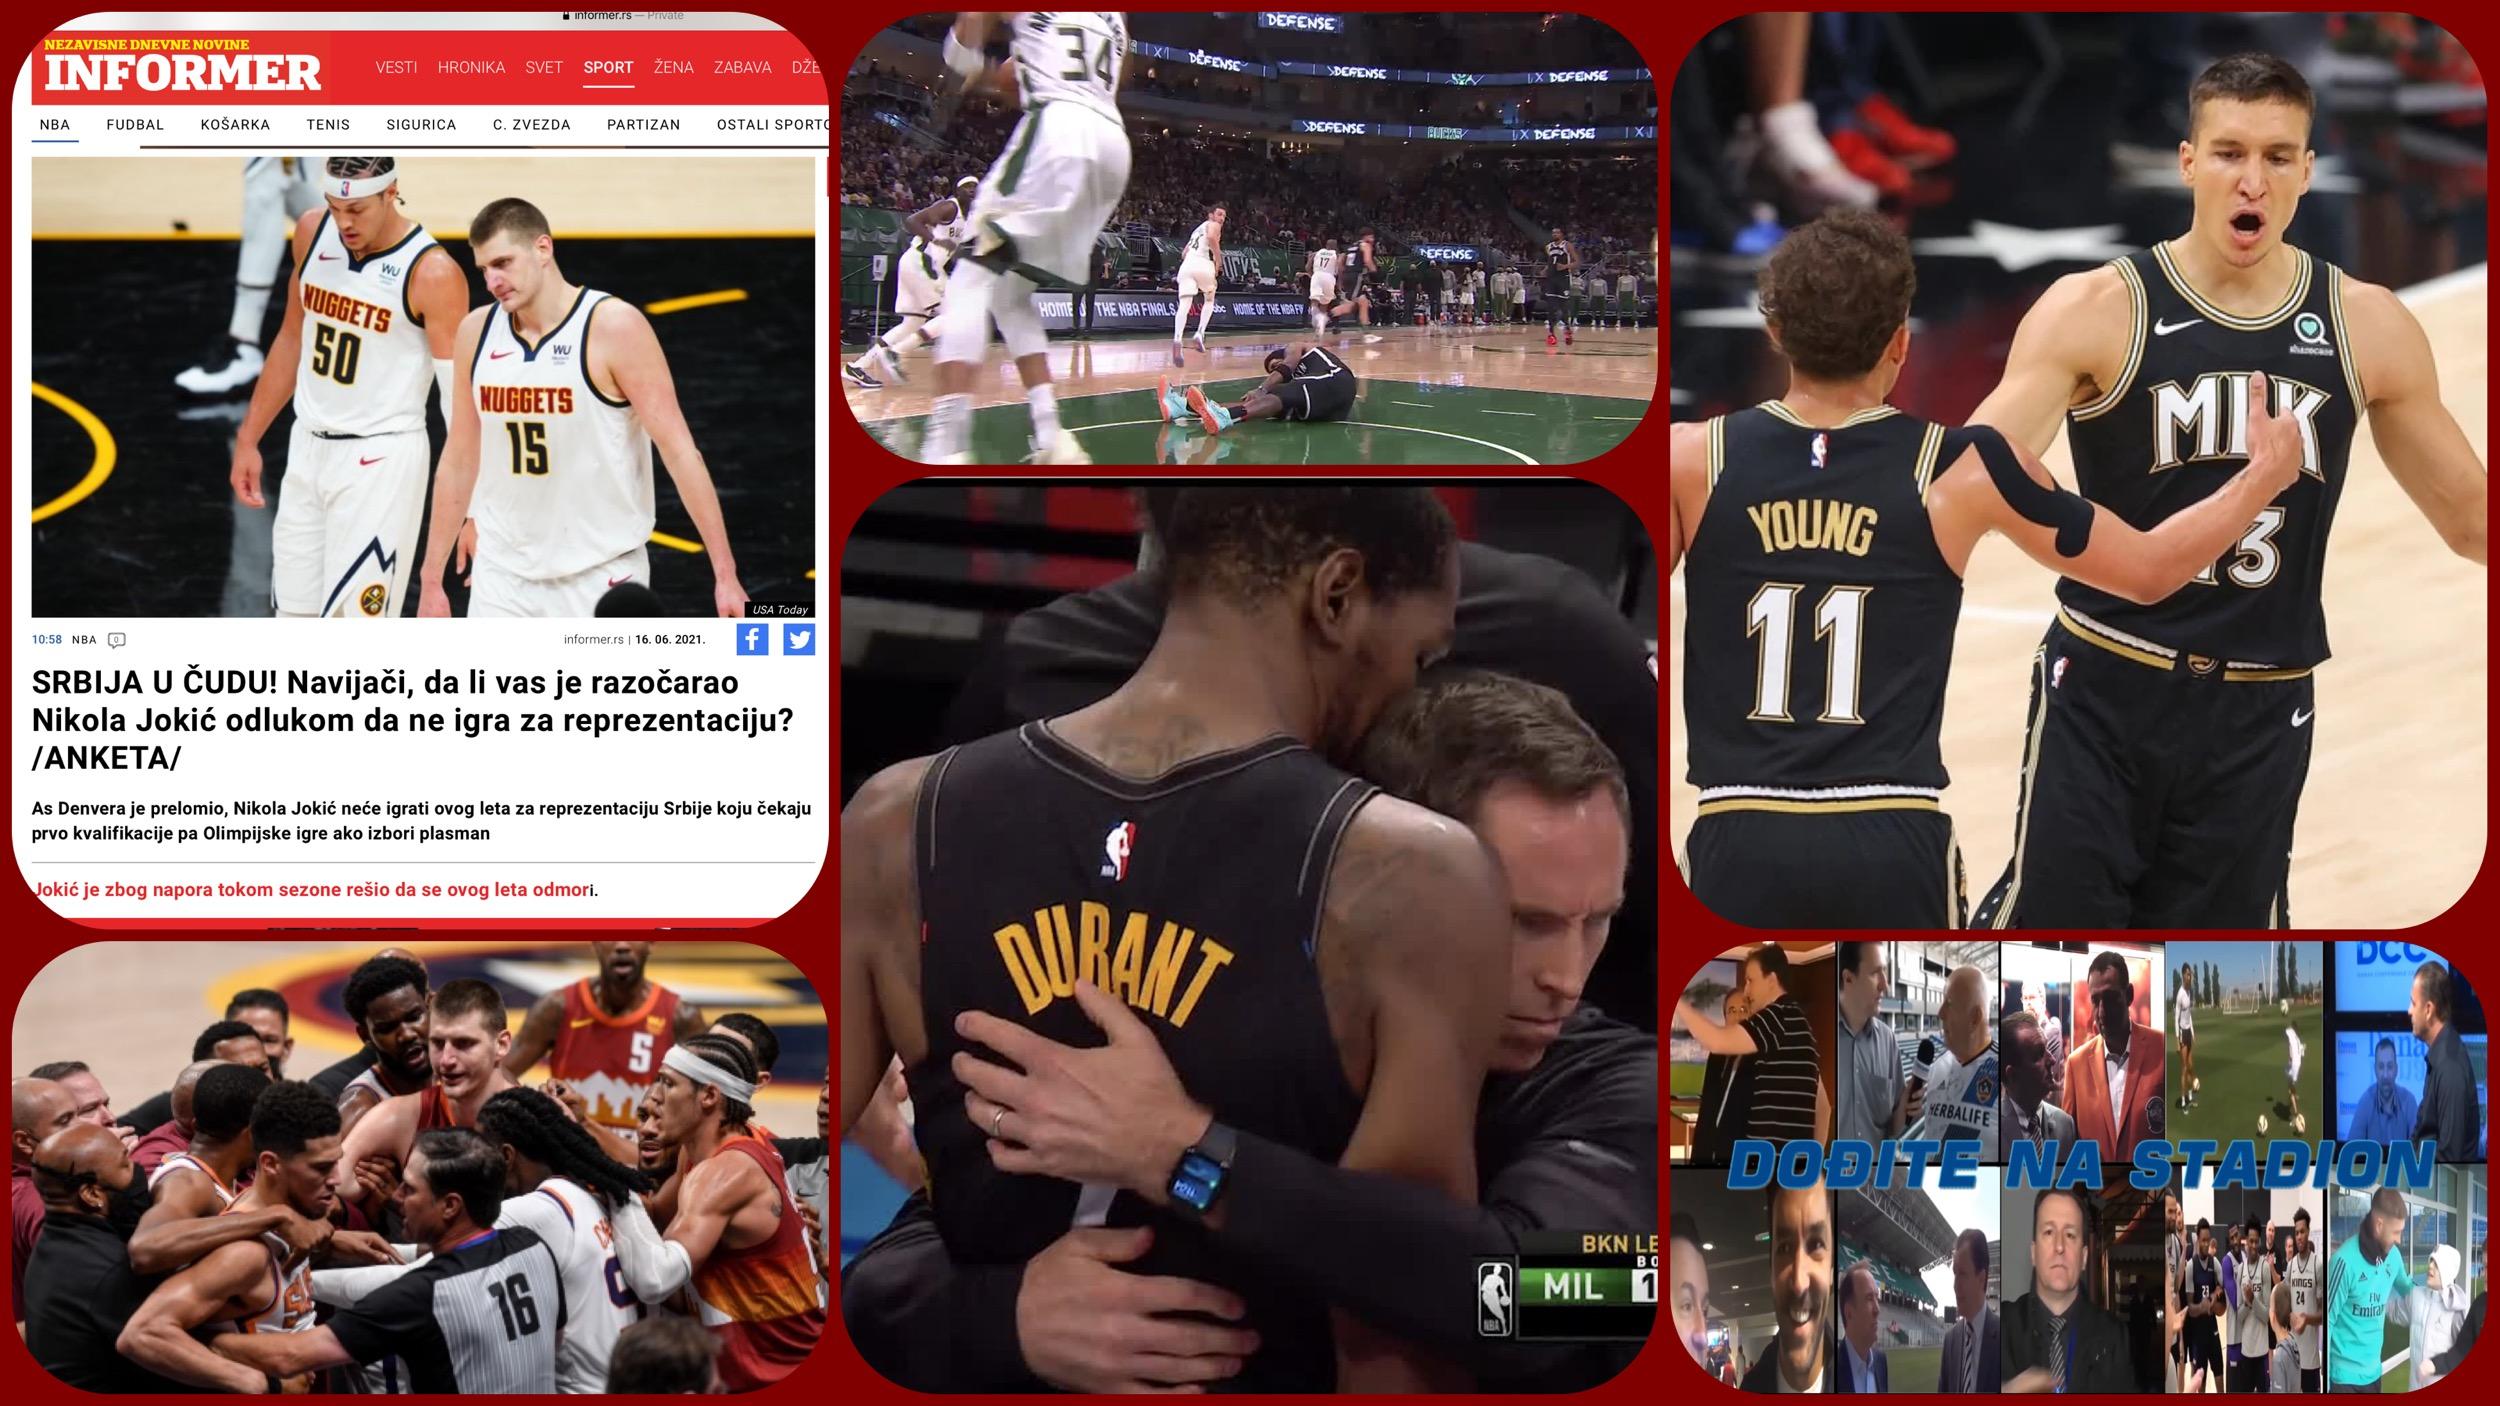 NBA Specijal. Sezona povreda, besmislena Olimpijada i patriotizam Nikole Jokića… (VIDEO)